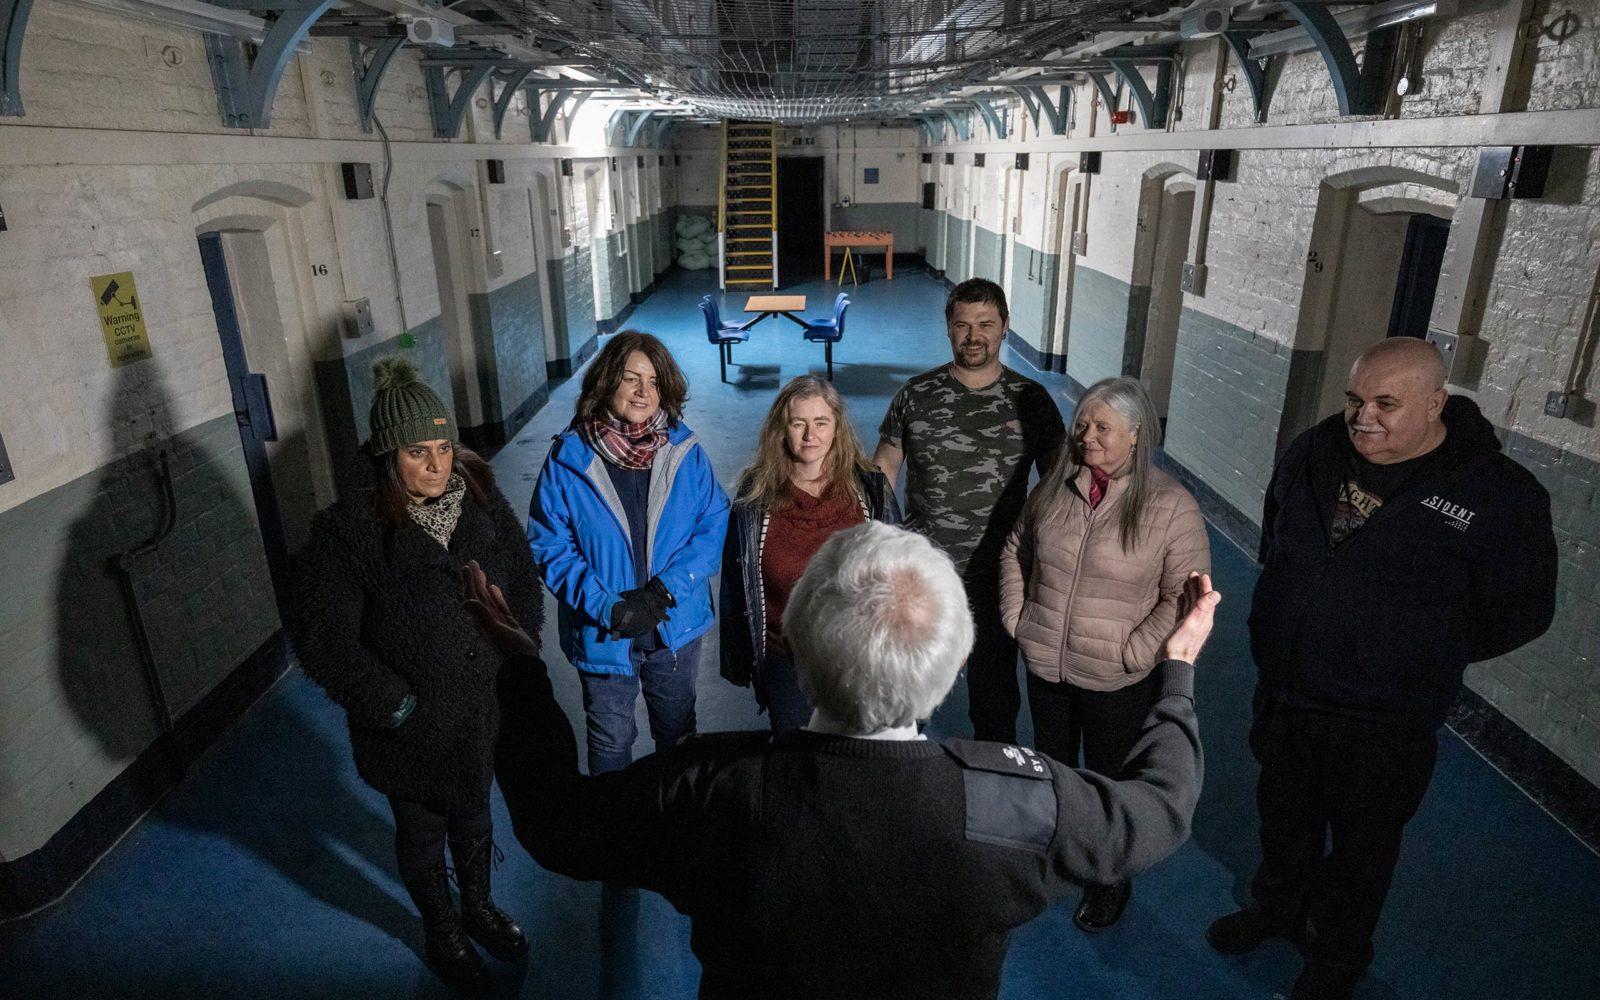 Shrewsbury Prison At Night | Shrewsbury Prison Lights Out Tour | Shrewsbury Prison Night Tour